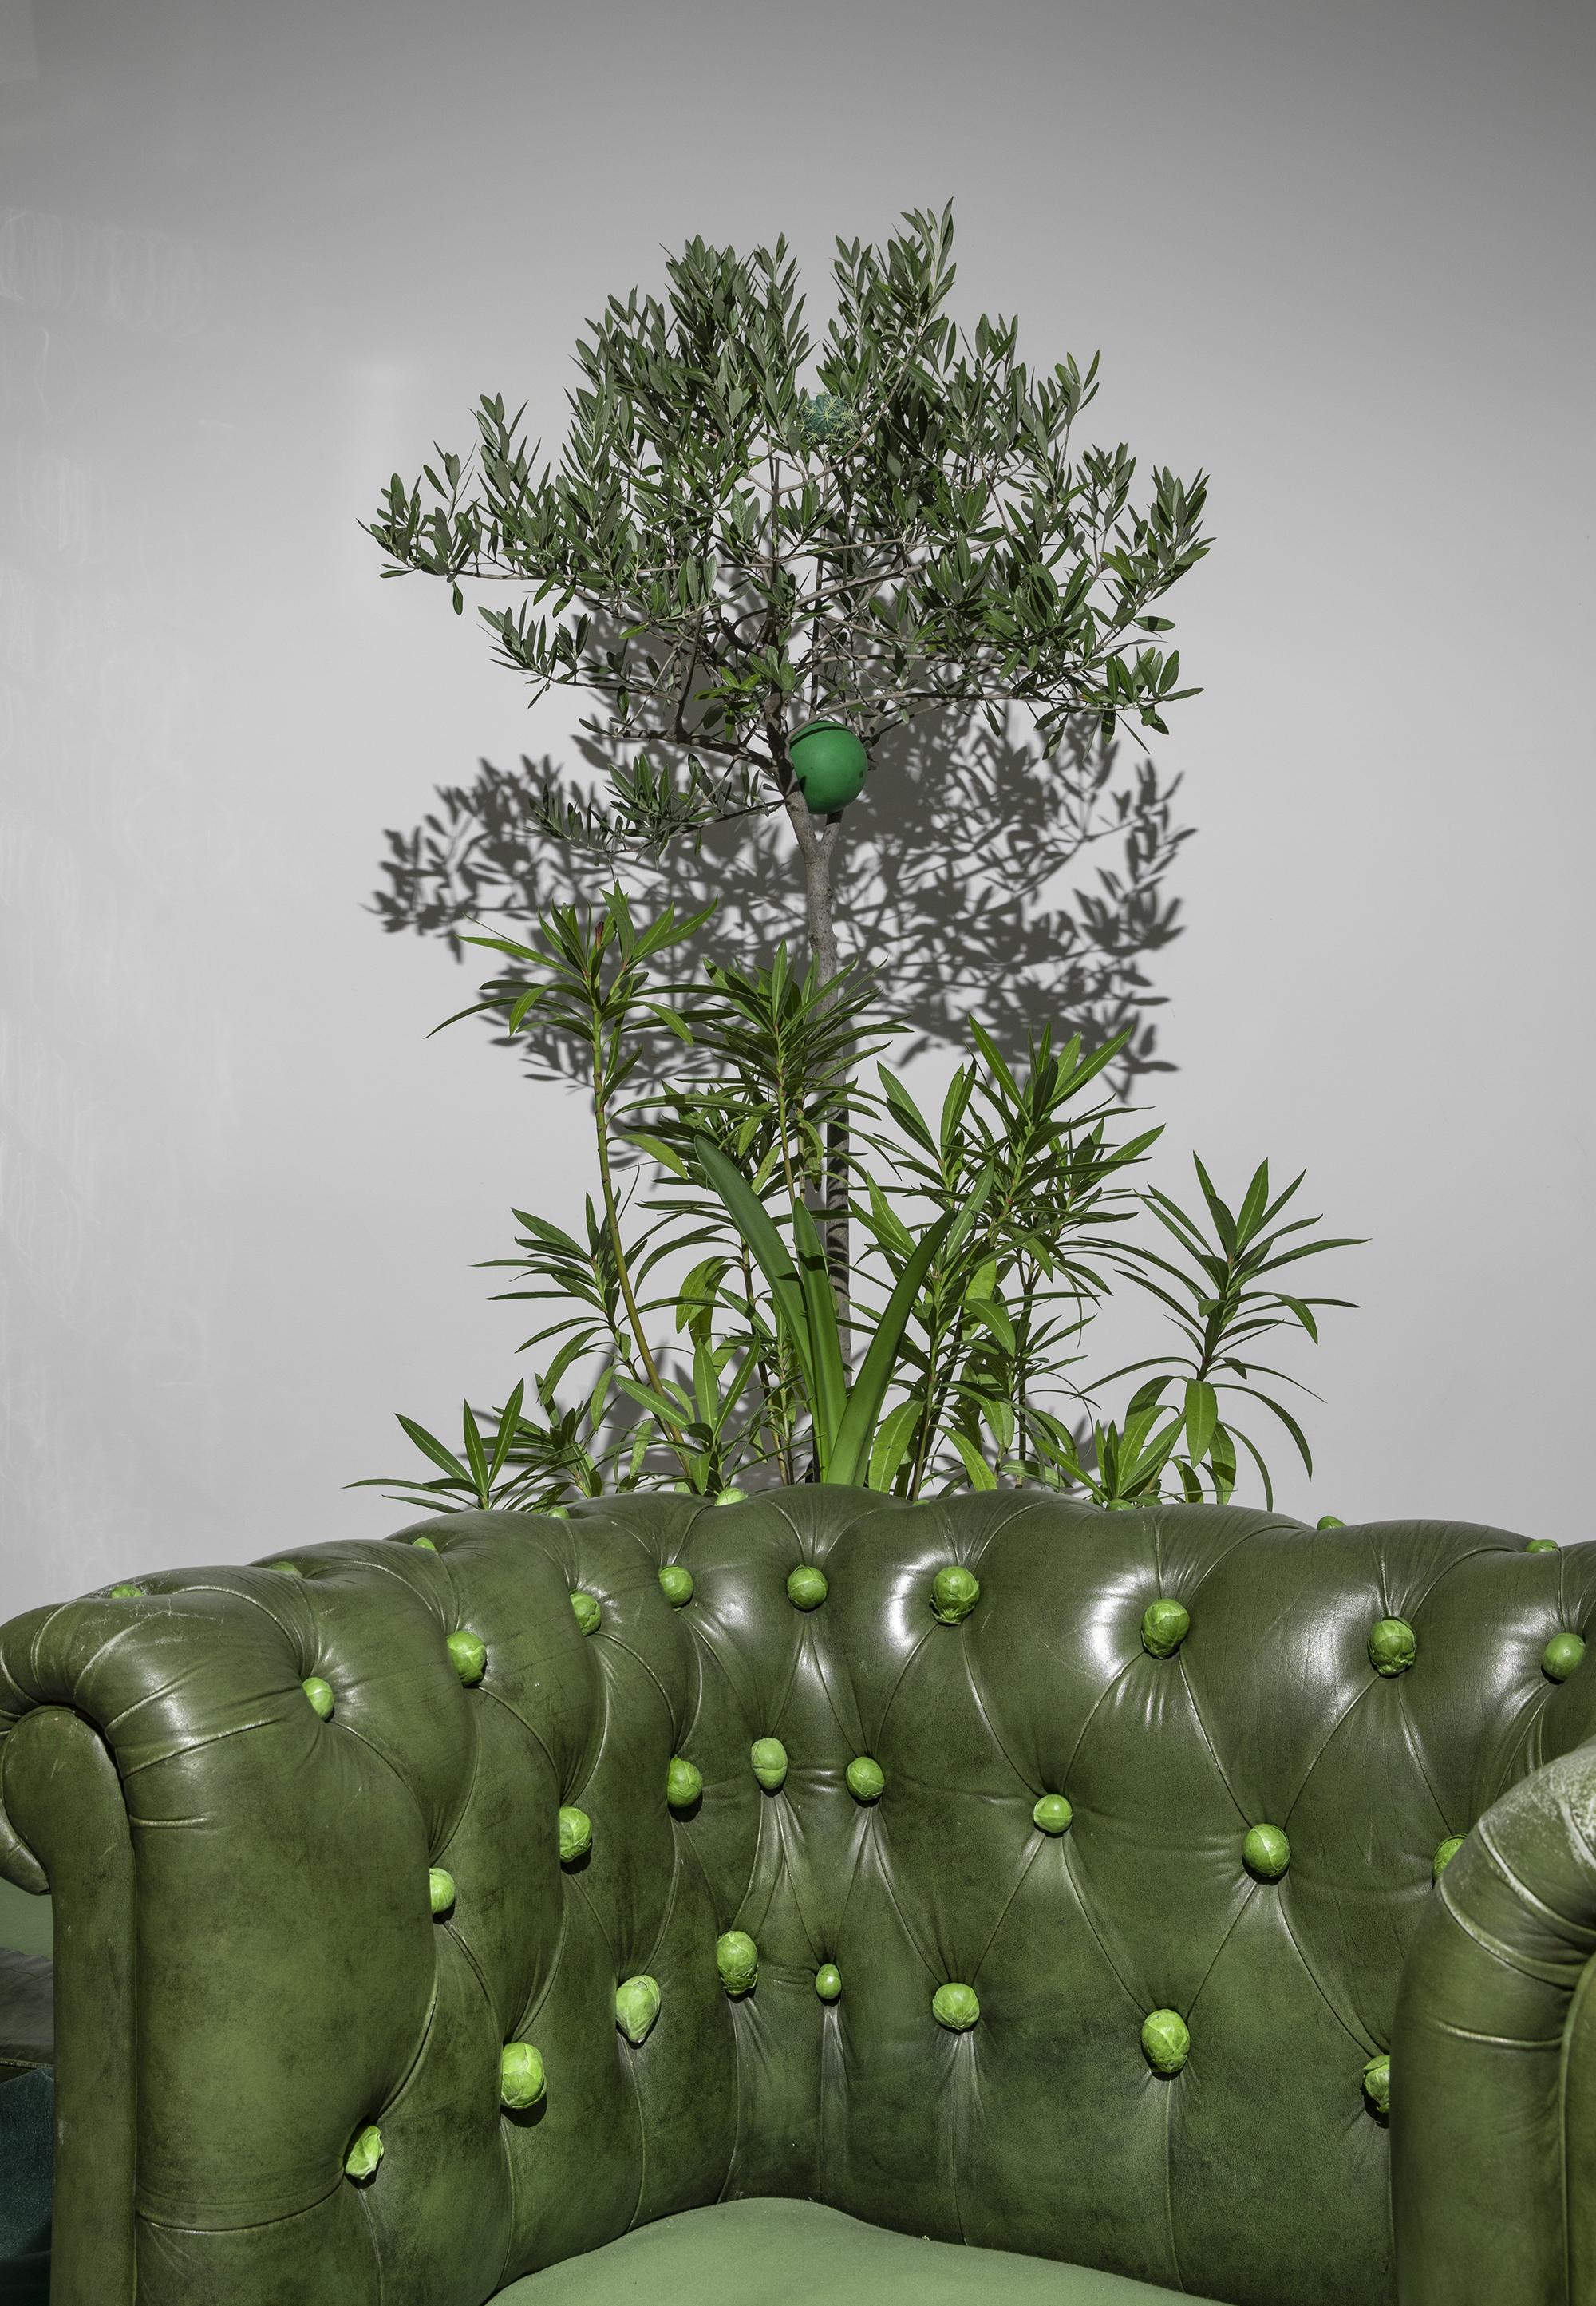 armchair Bruxelles sprouts